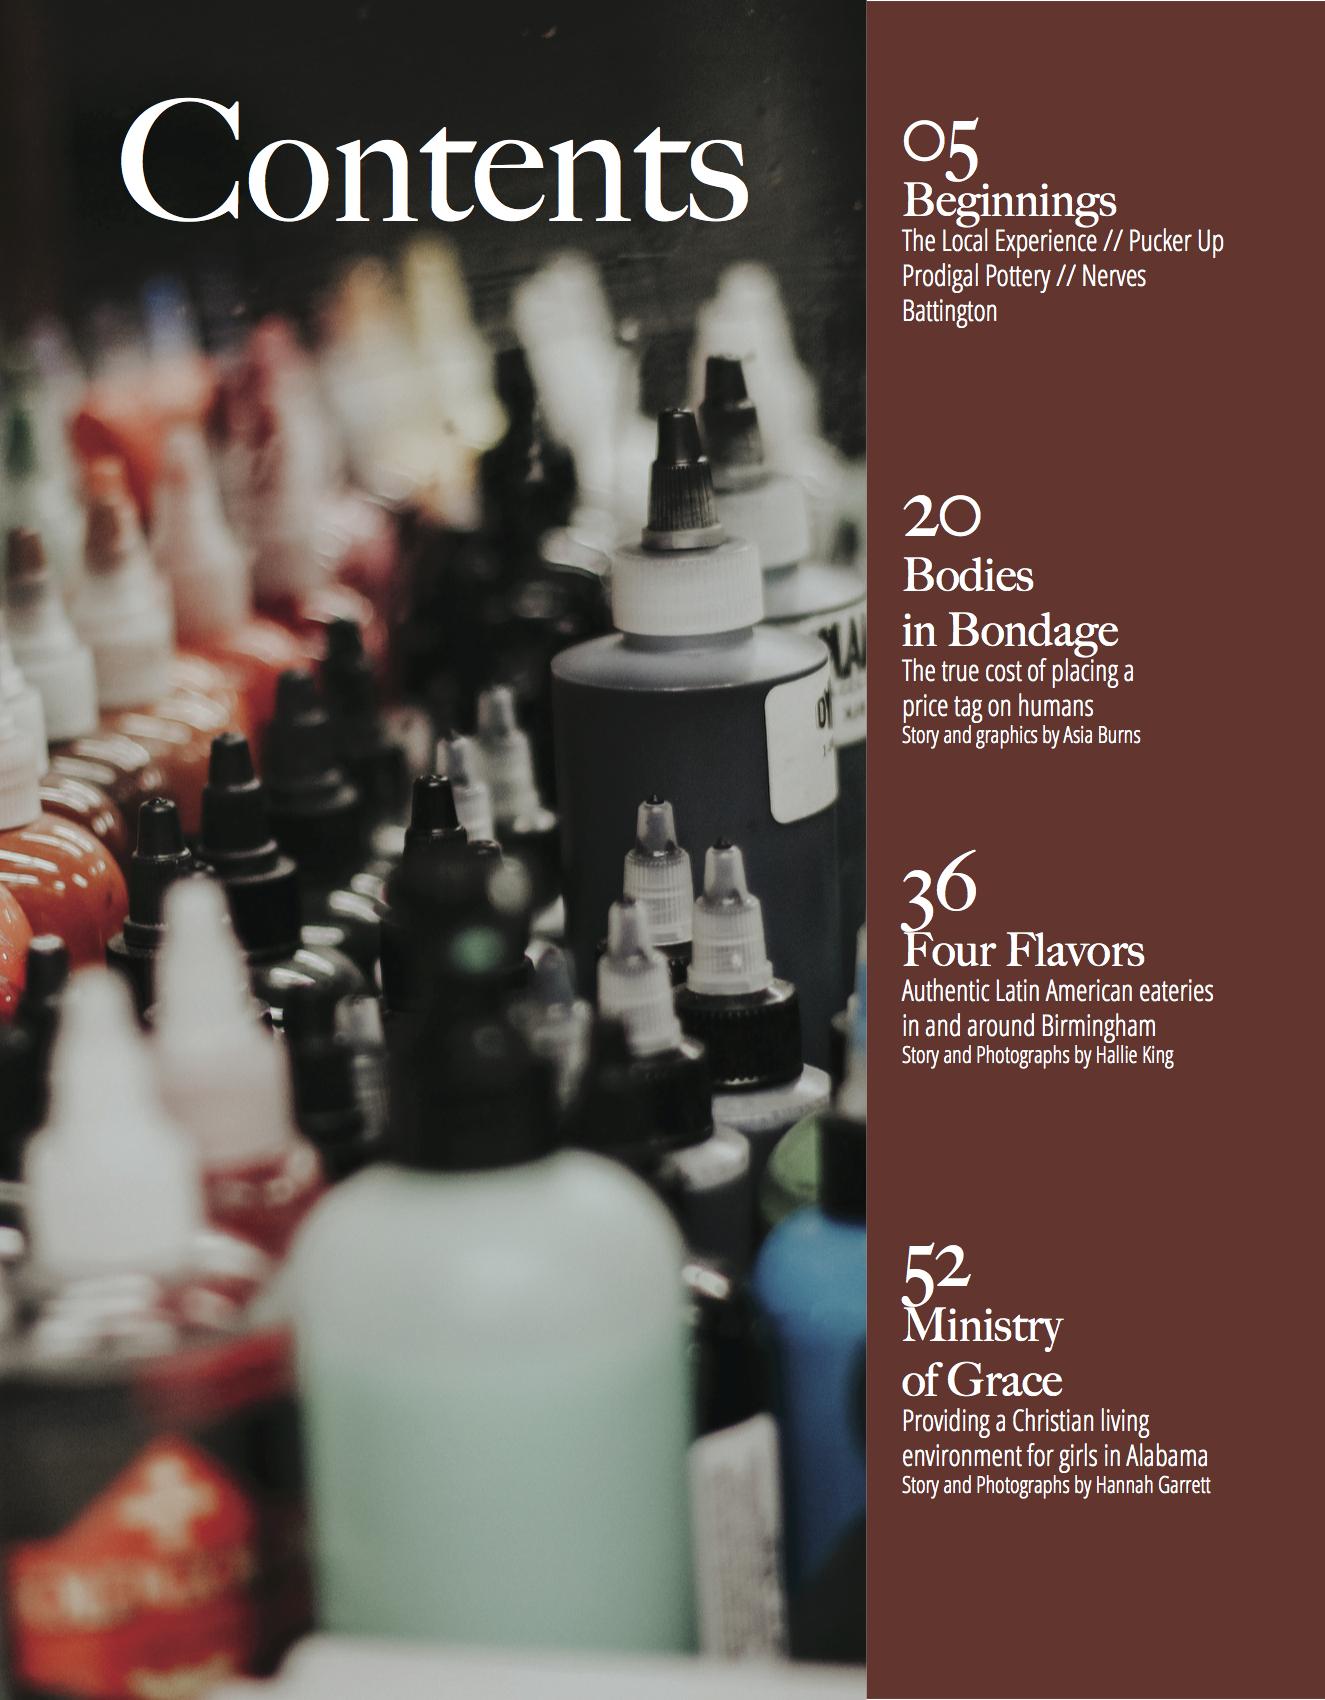 ContentPage.jpg